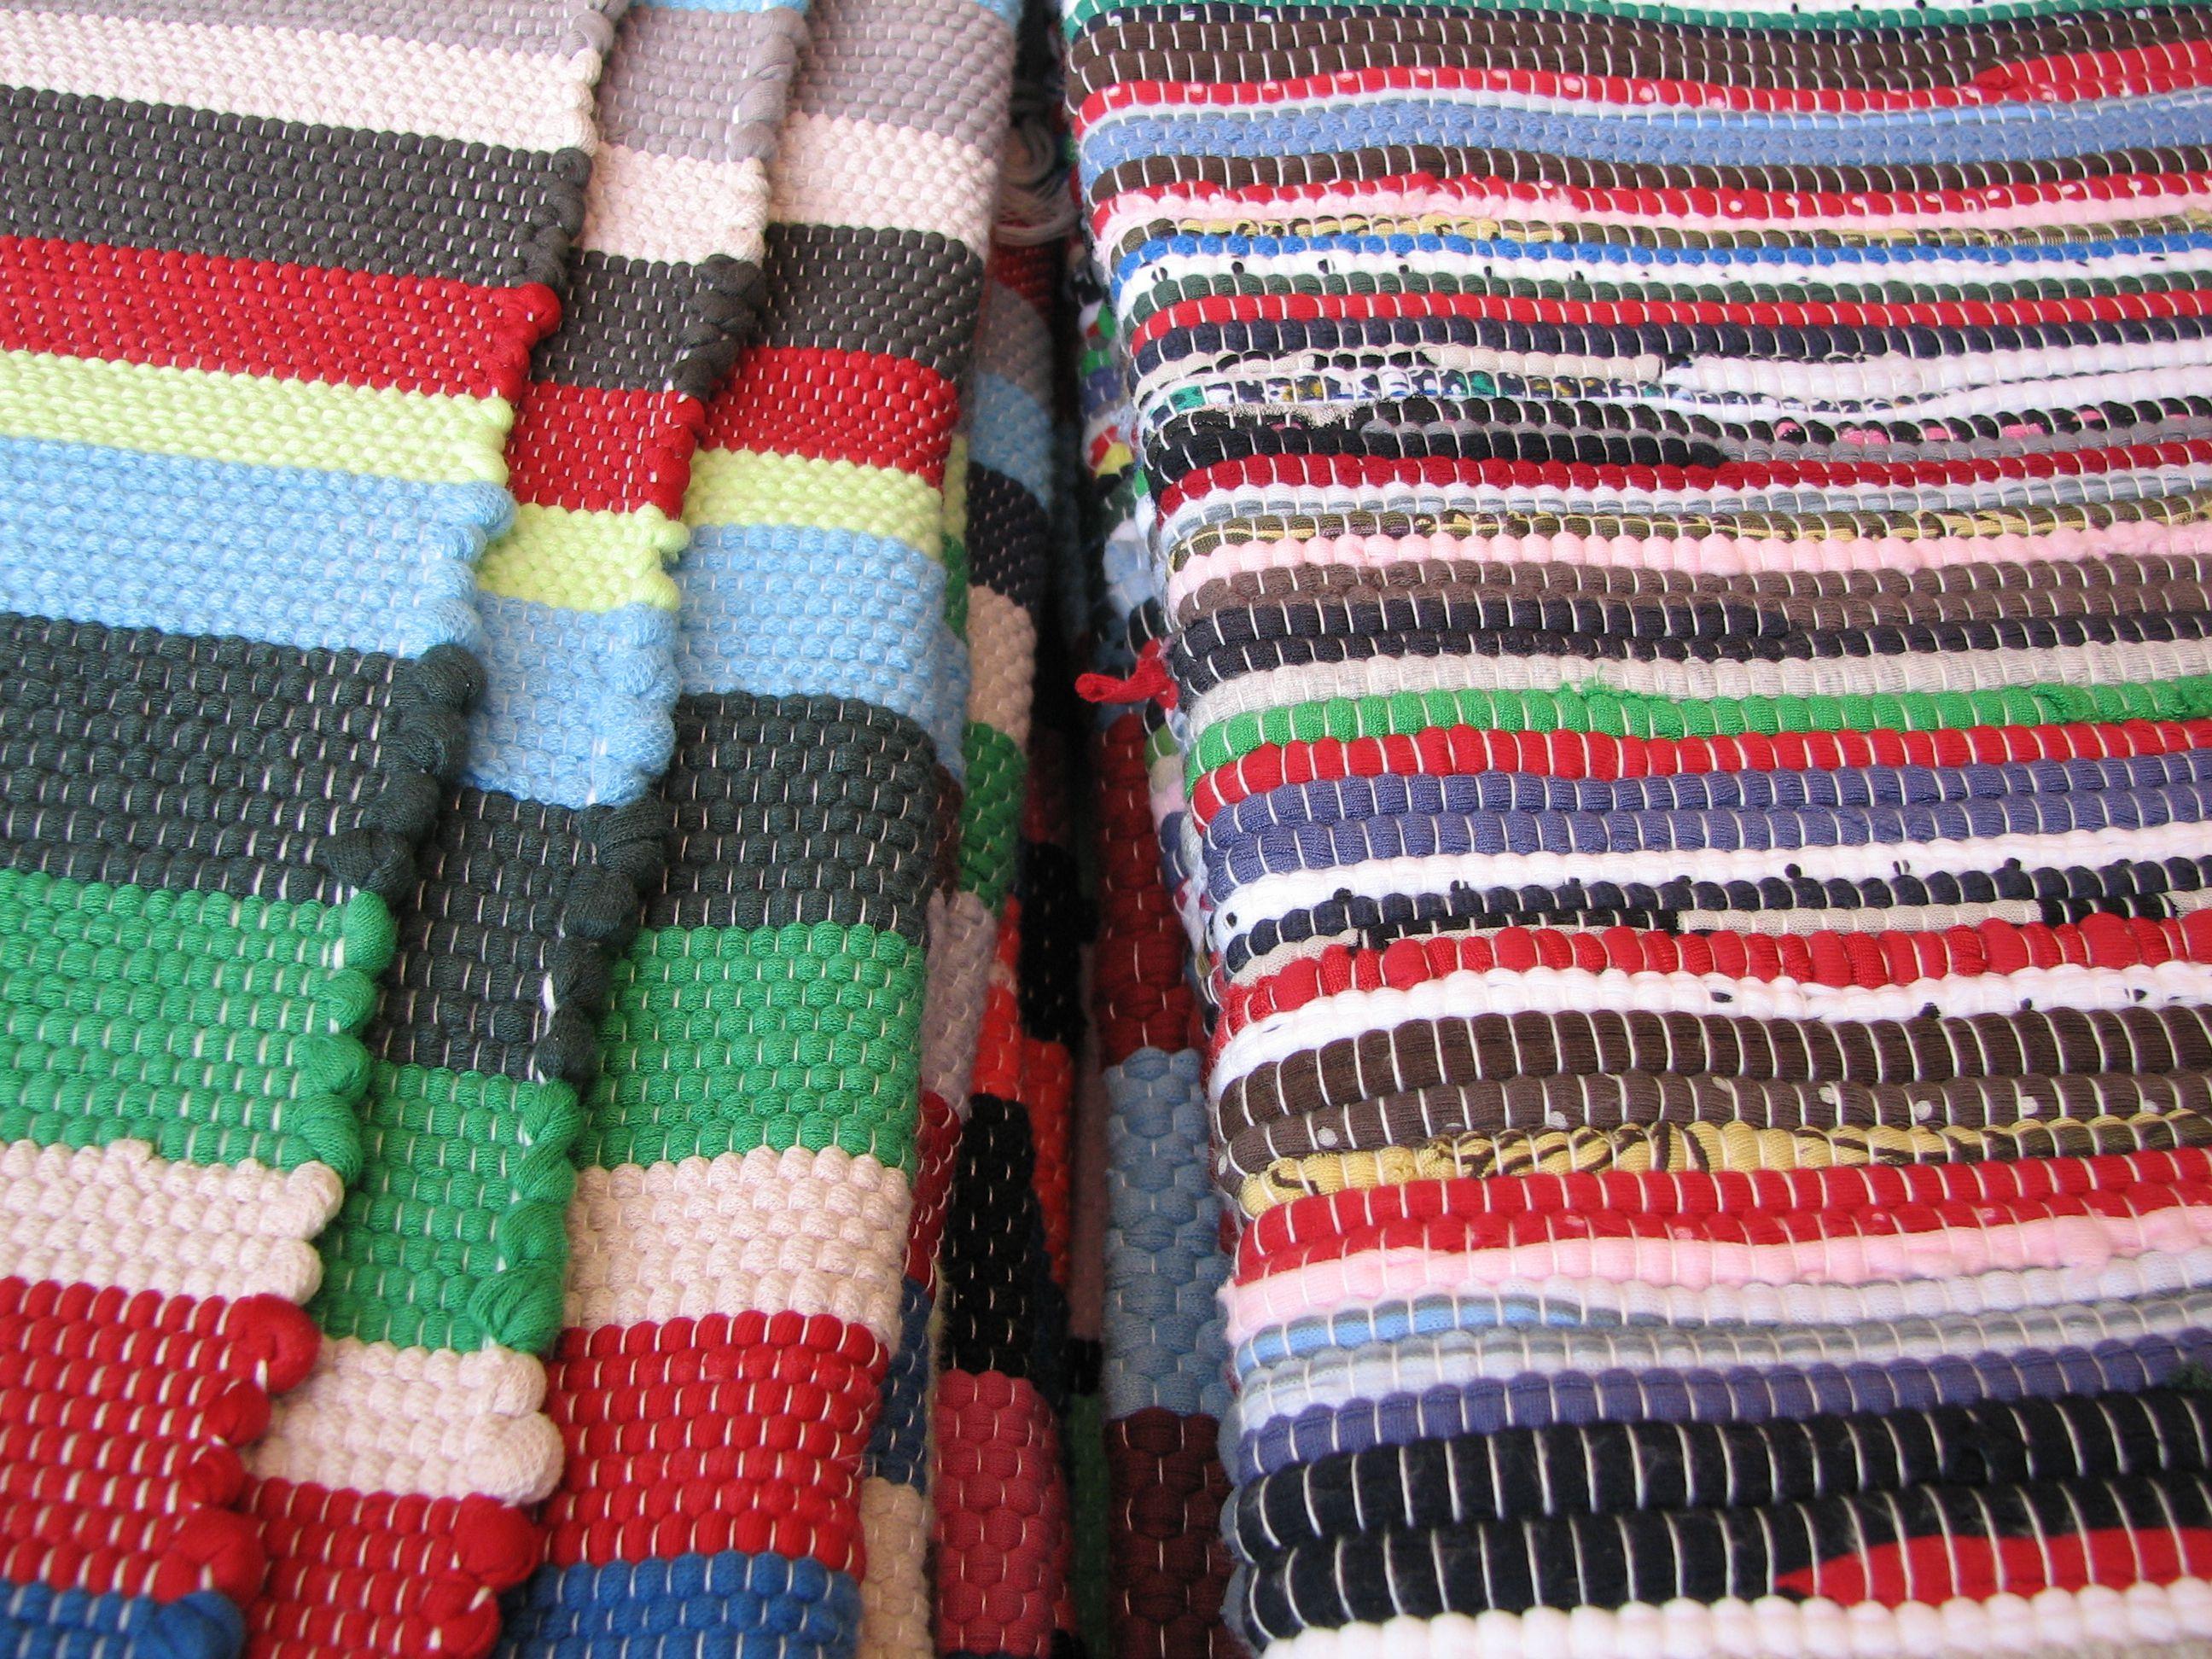 Need Help With Crocheting Rag Rugs? Look No Further  Beginner Crochet